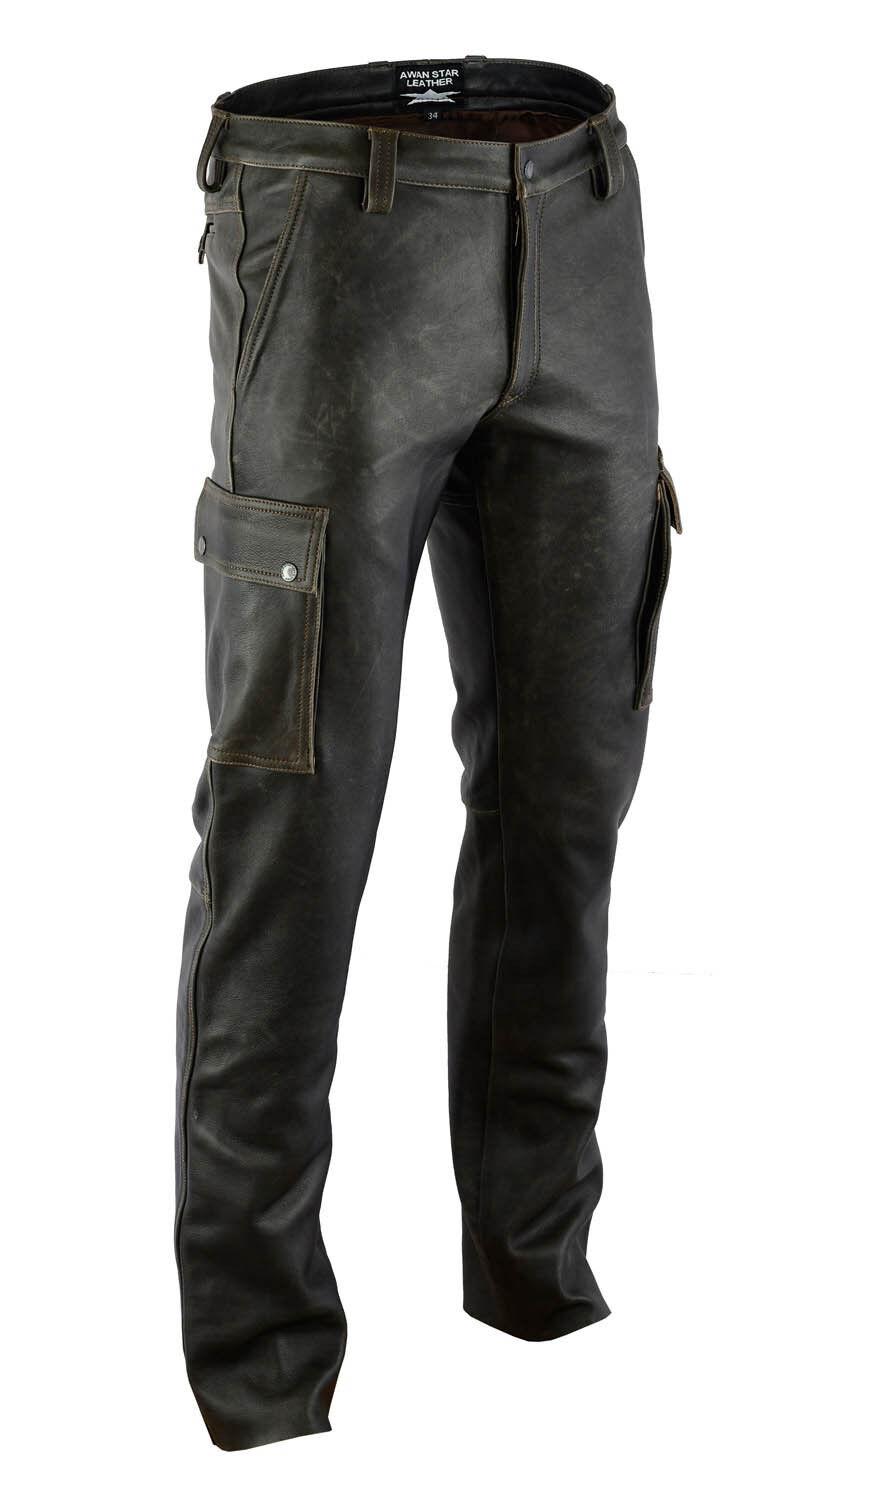 AW7910 Cargo trousers,combat vintage soft leather pants Cargo Hose,pantalon cuir